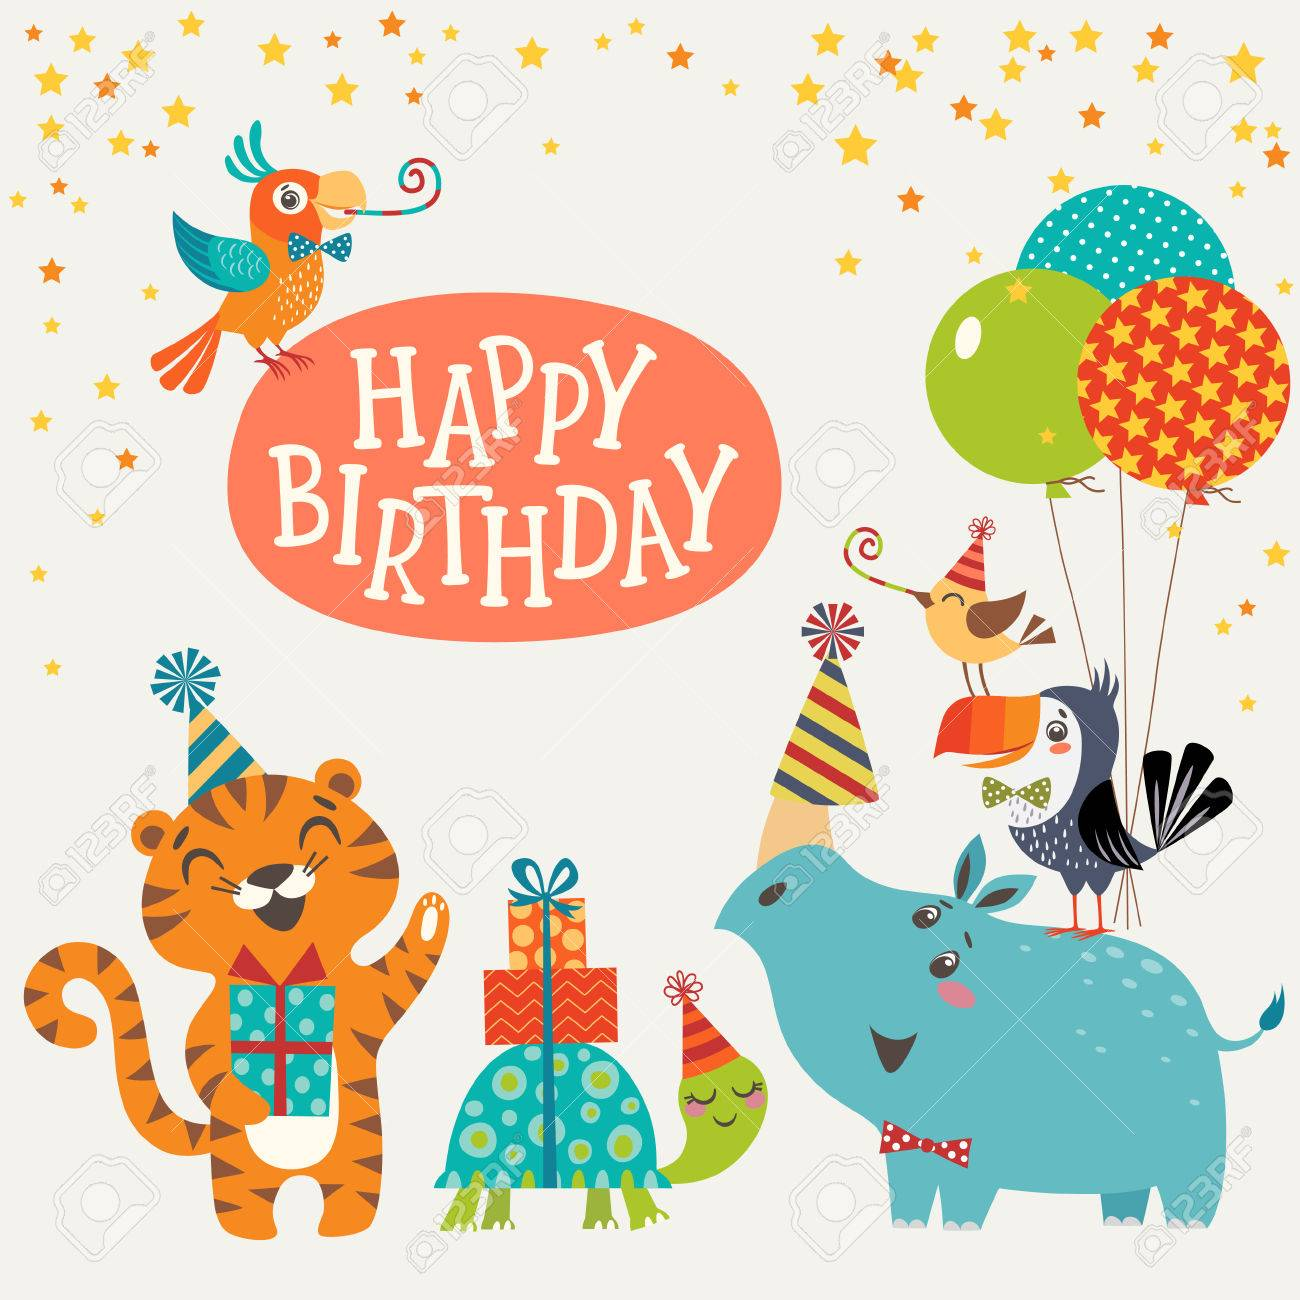 Happy birthday design with cute jungle animals. - 59114257